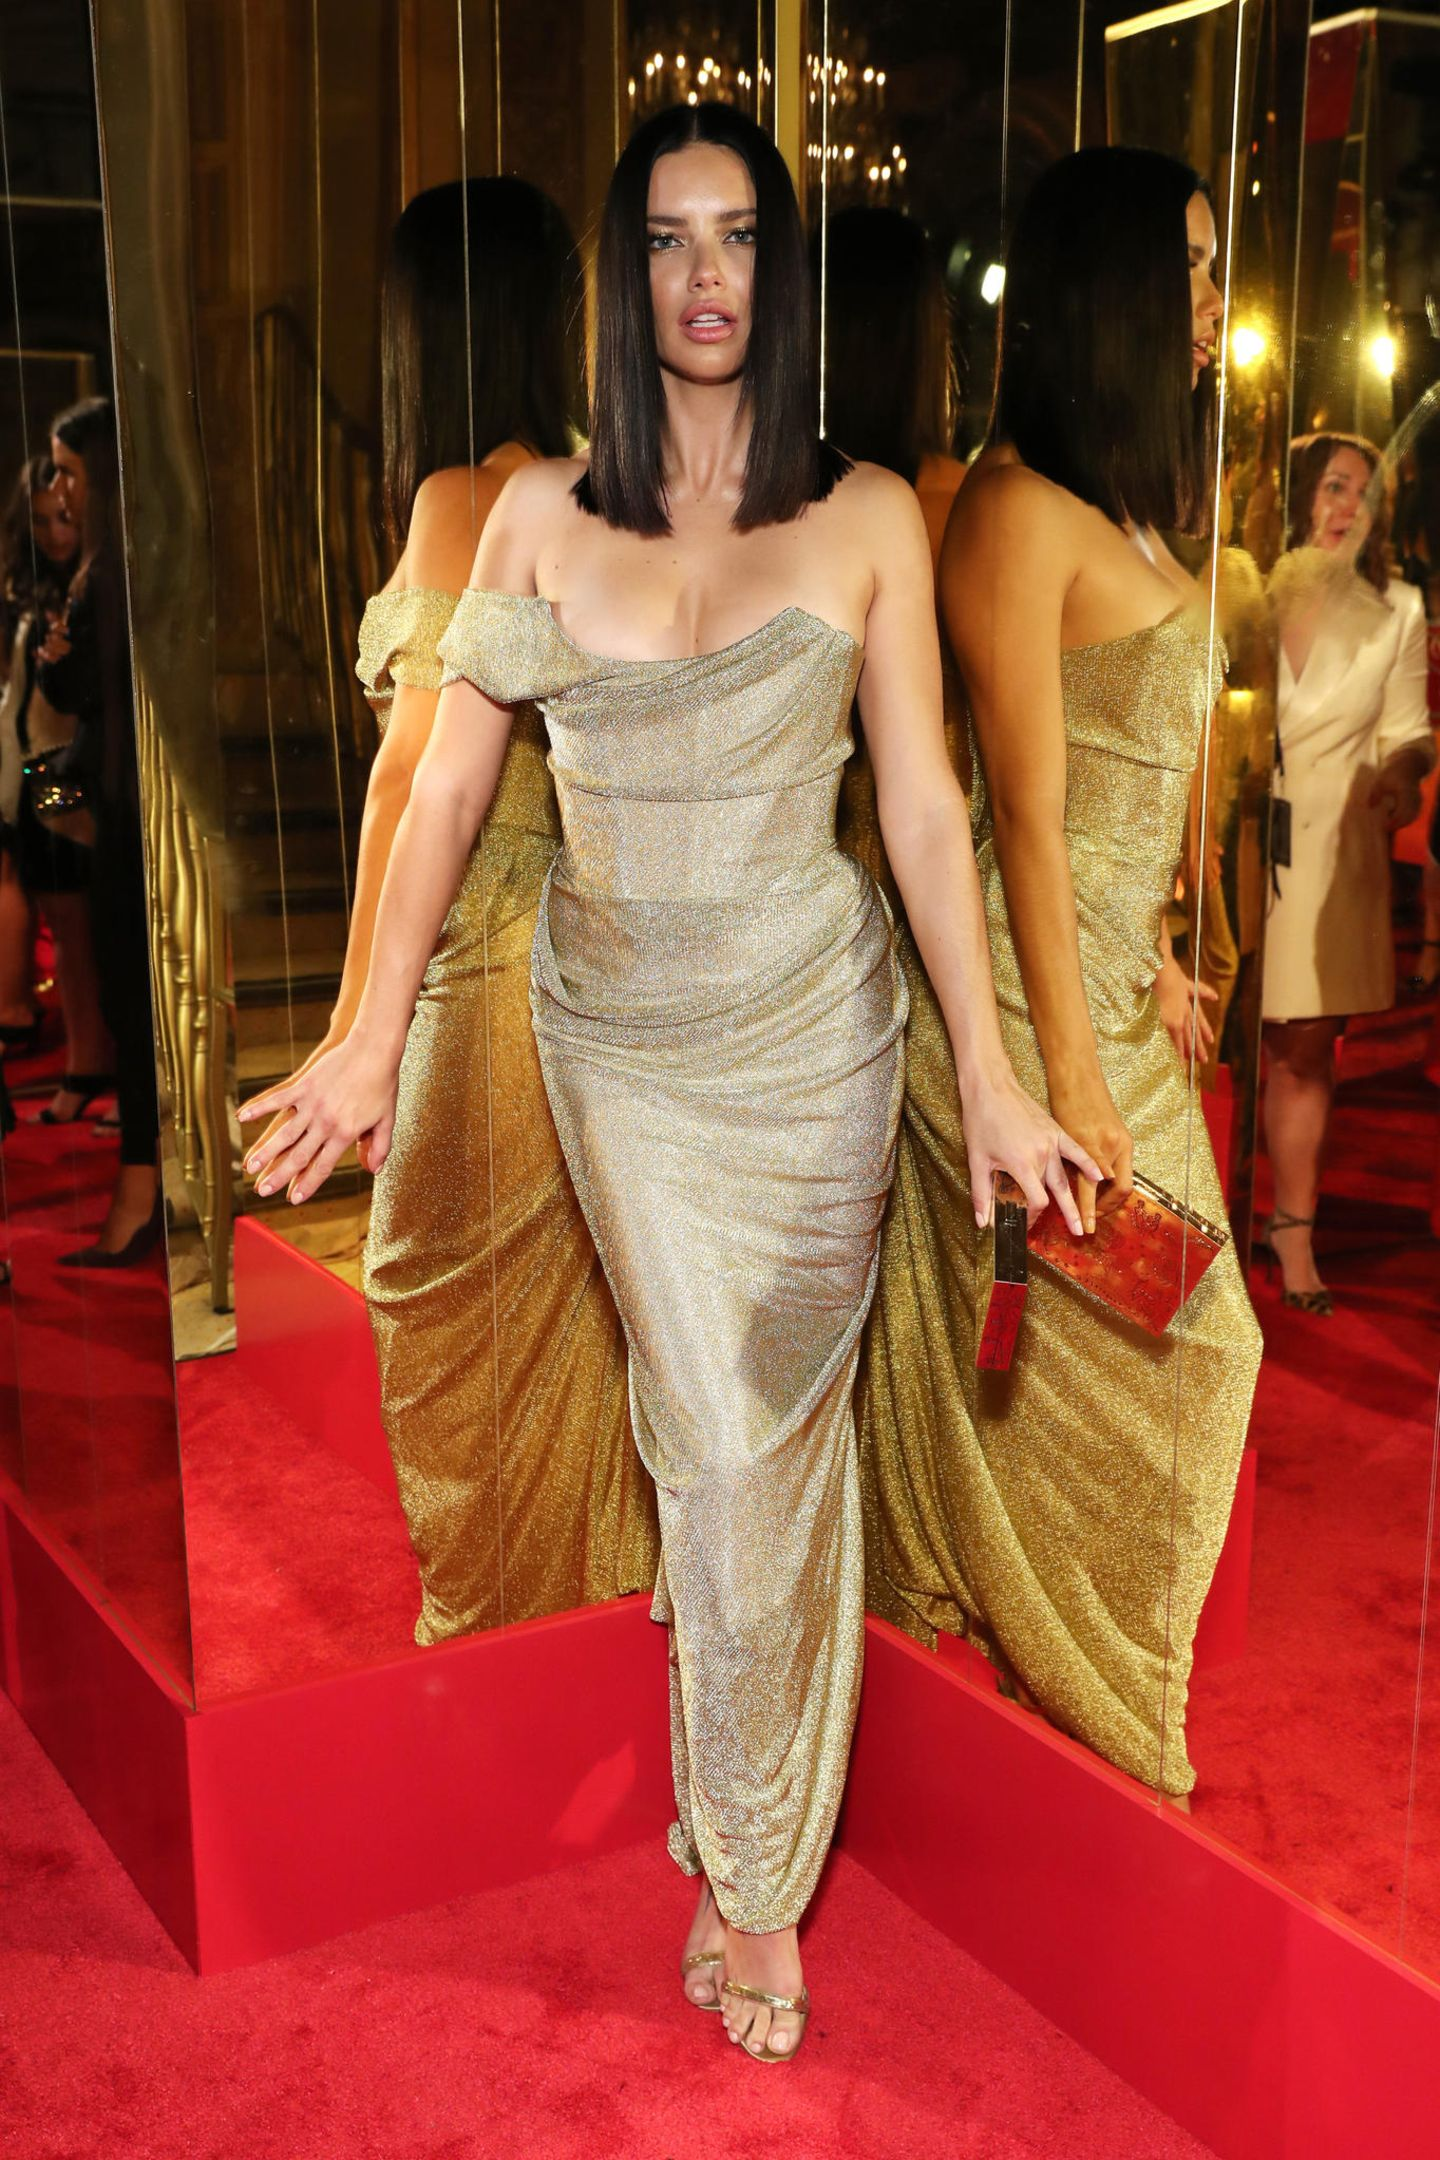 Verführung pur: Topmodel Adriana Lima